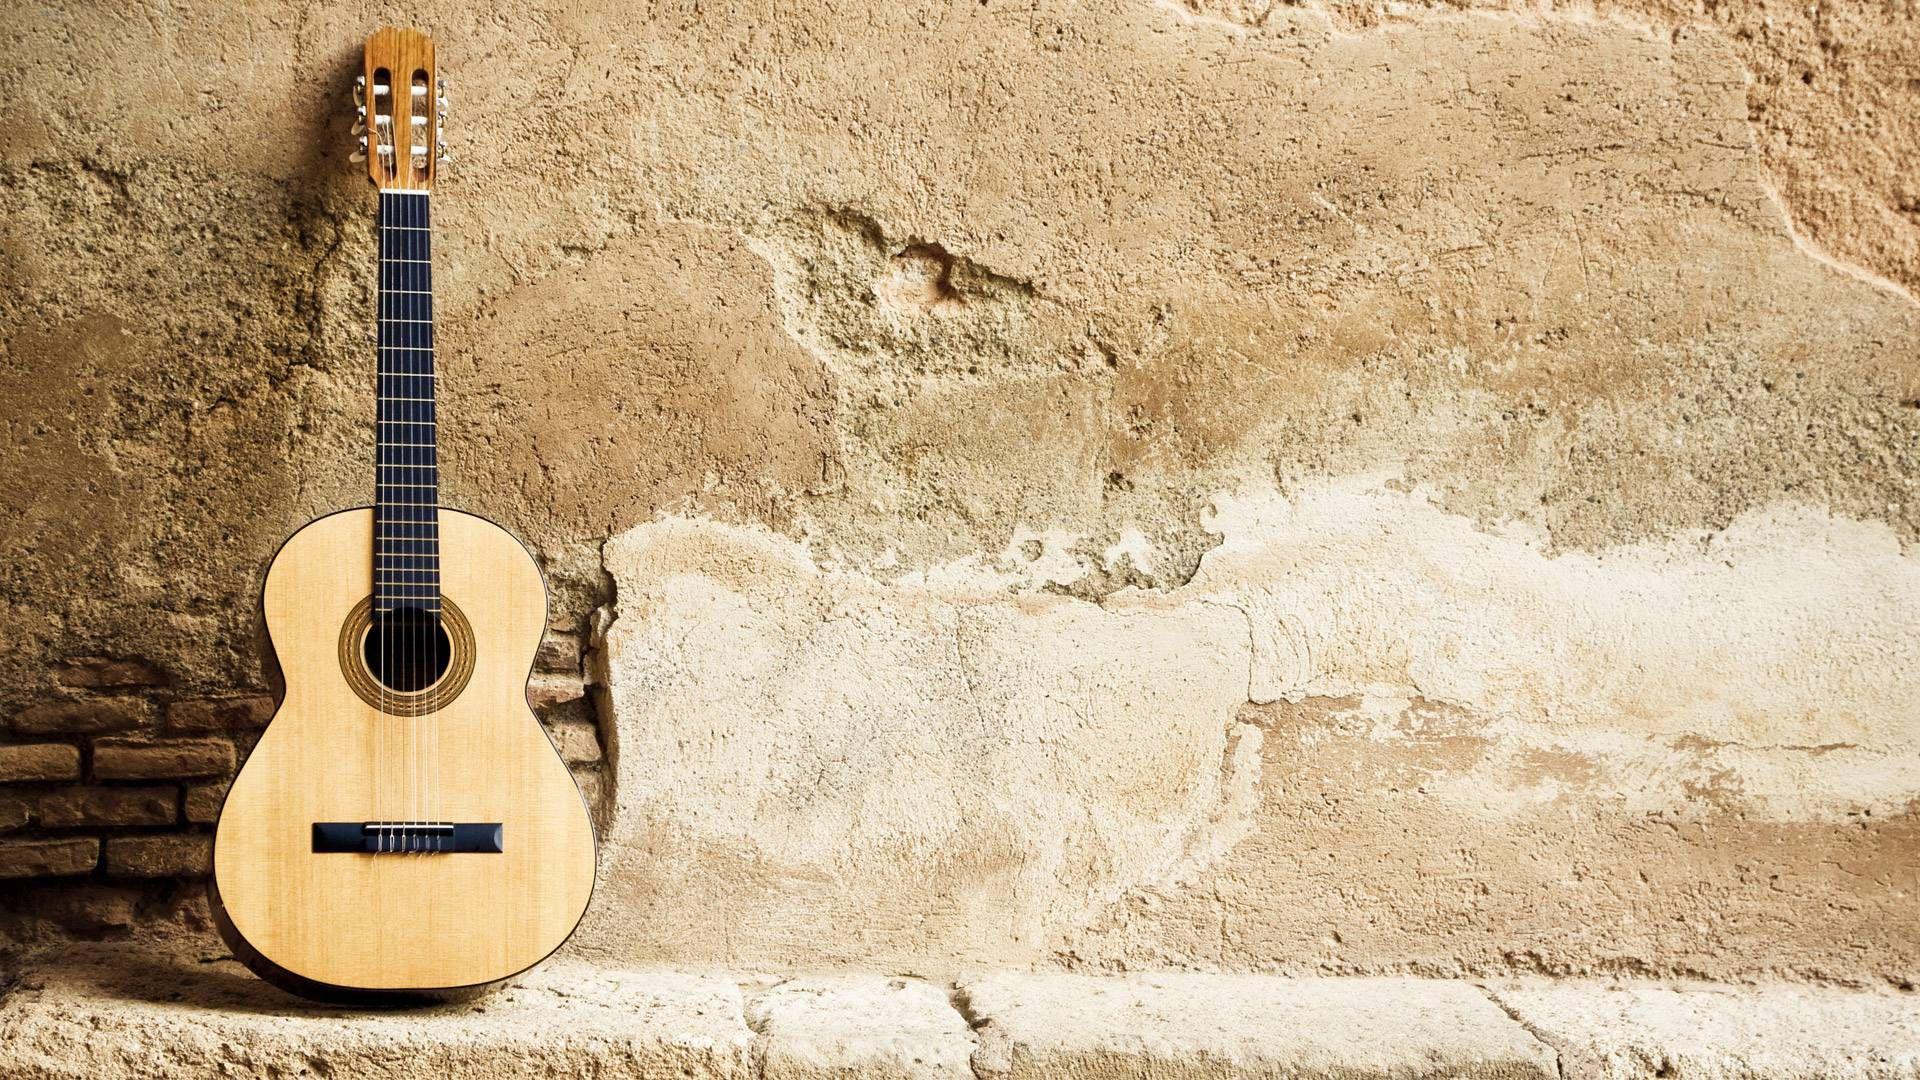 Acoustic Guitar Wallpapers High Resolution With High Resolution 1920x1080 Px 1 44 Mb Guitarra Semi Acustica Violao Guitarra